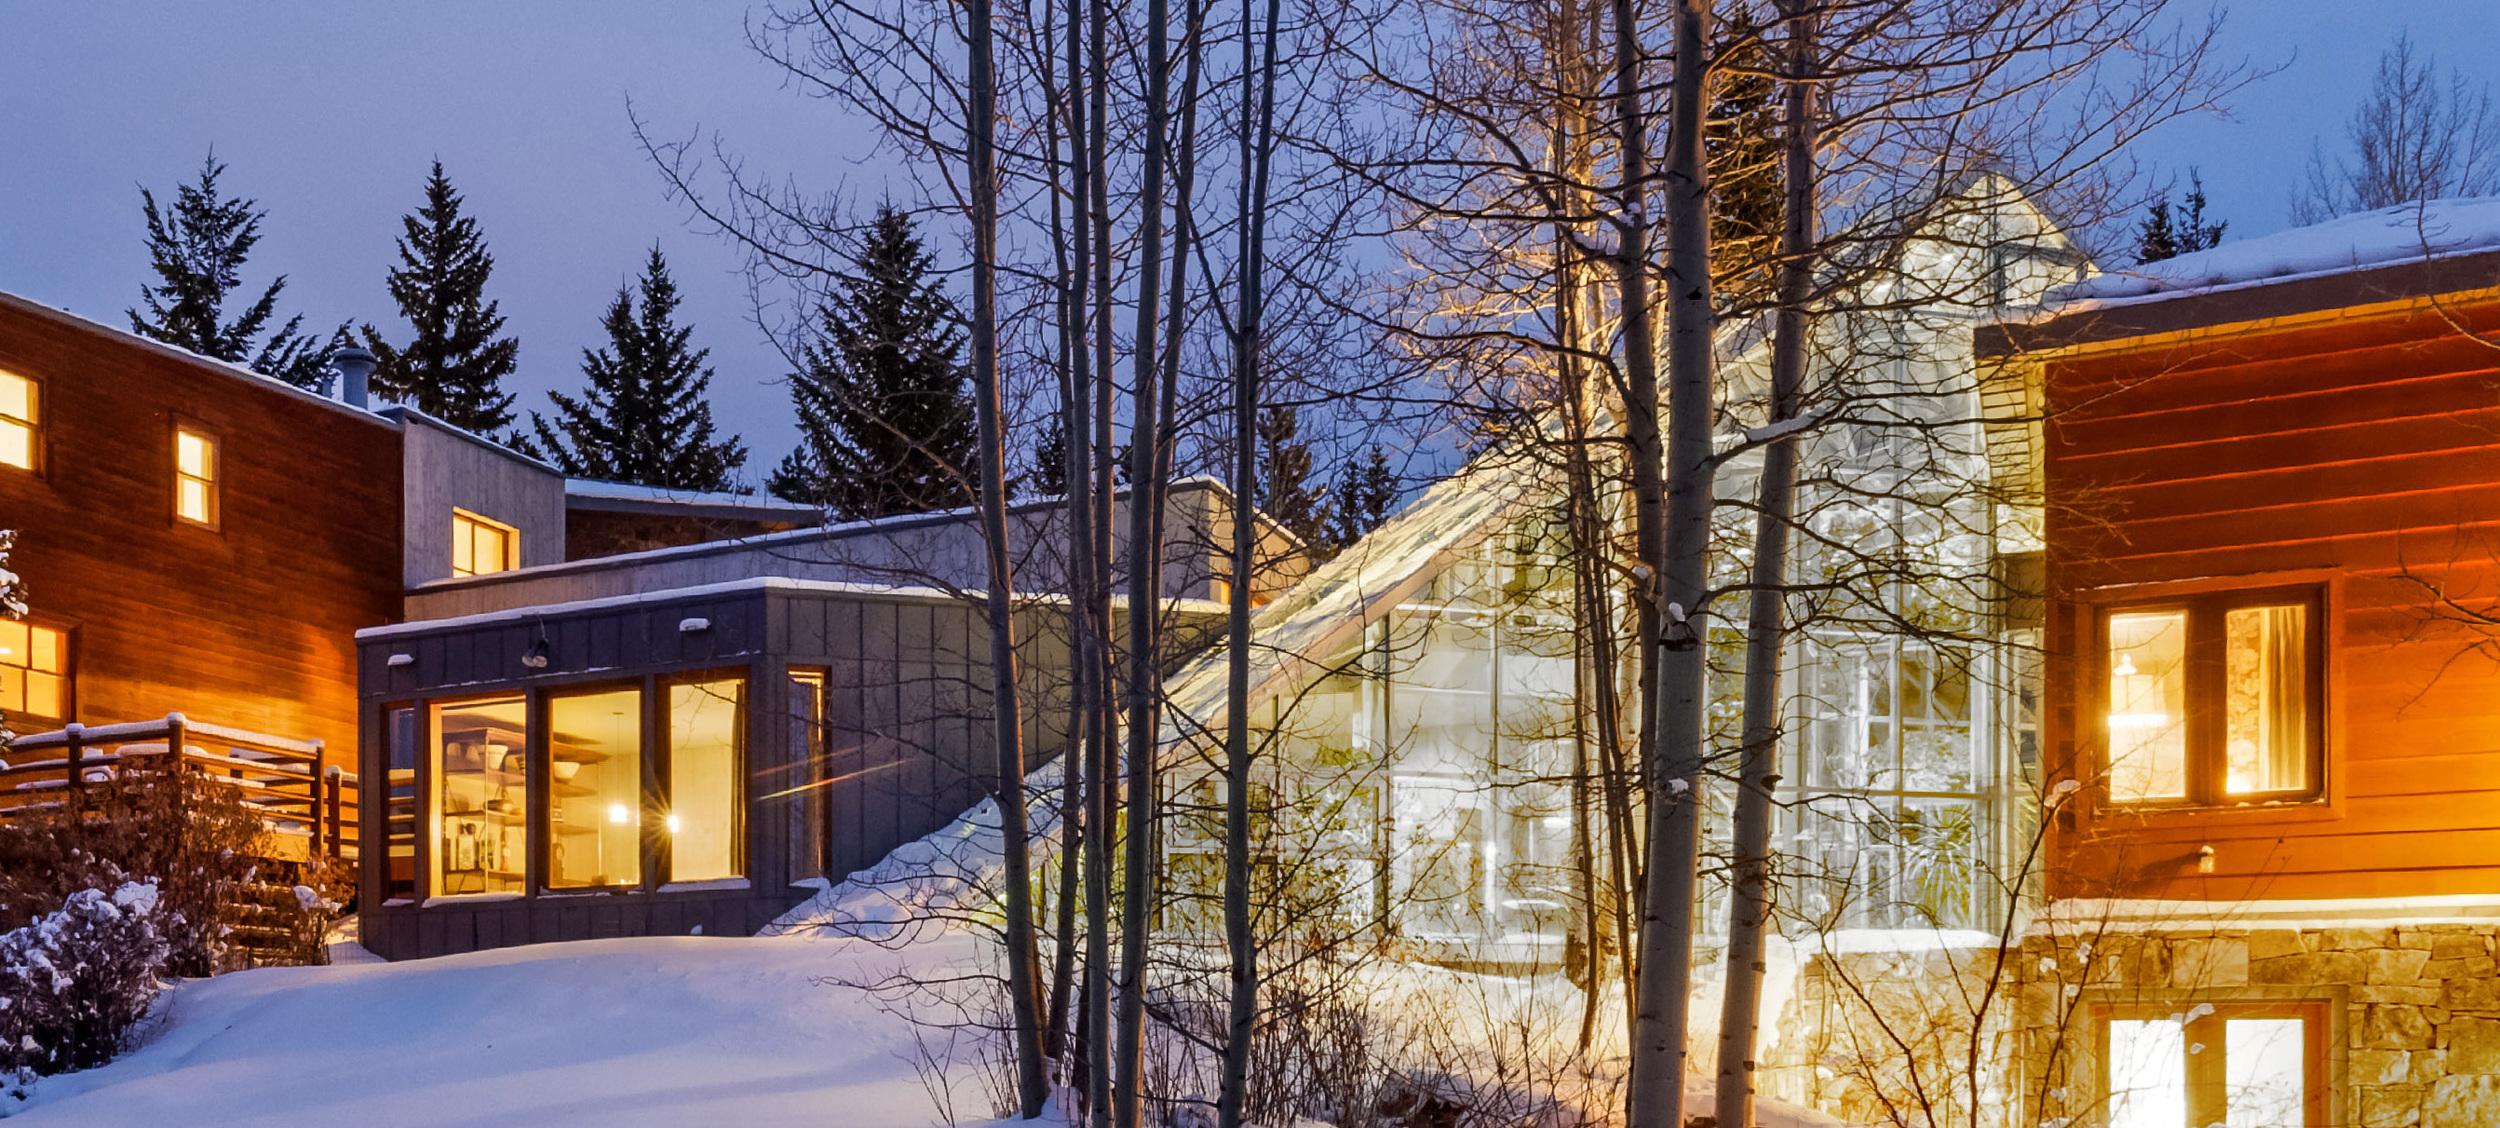 Exterior Greenhouse Winter.jpg